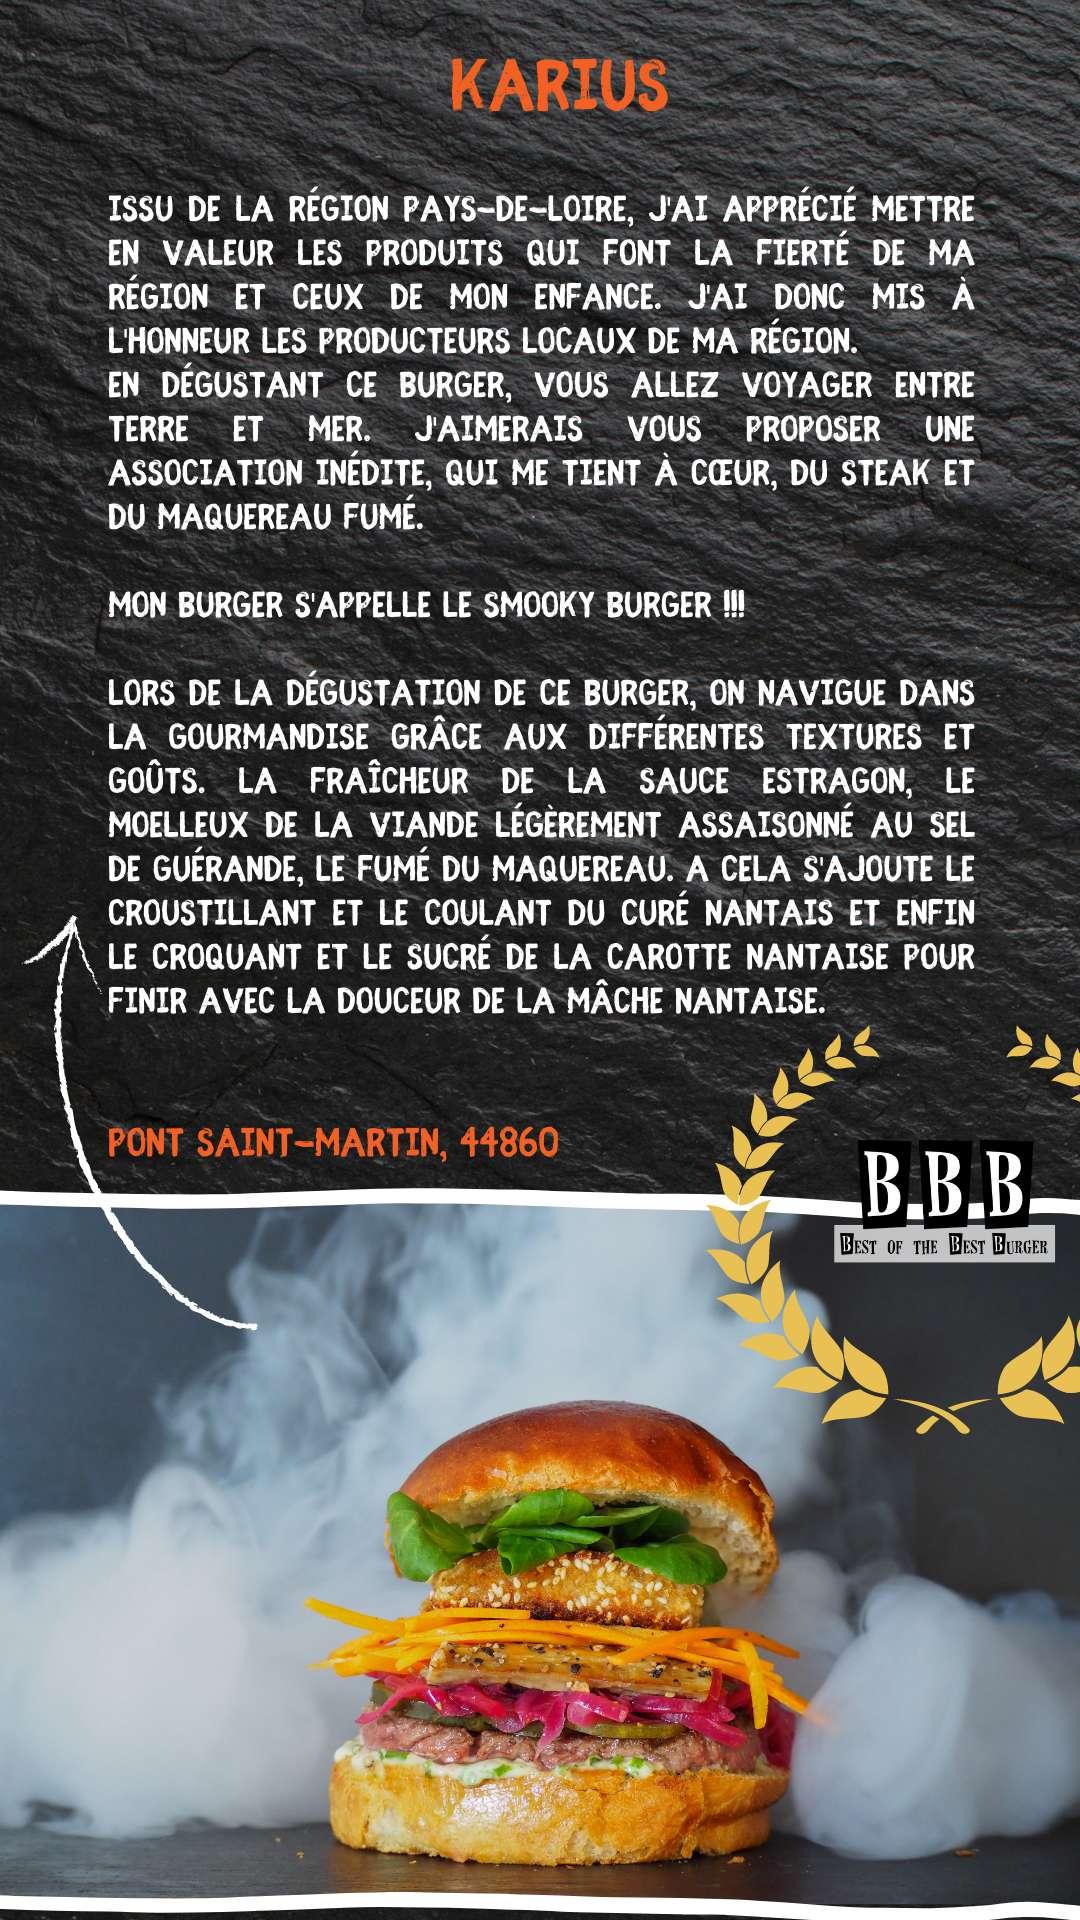 Burger du Karius